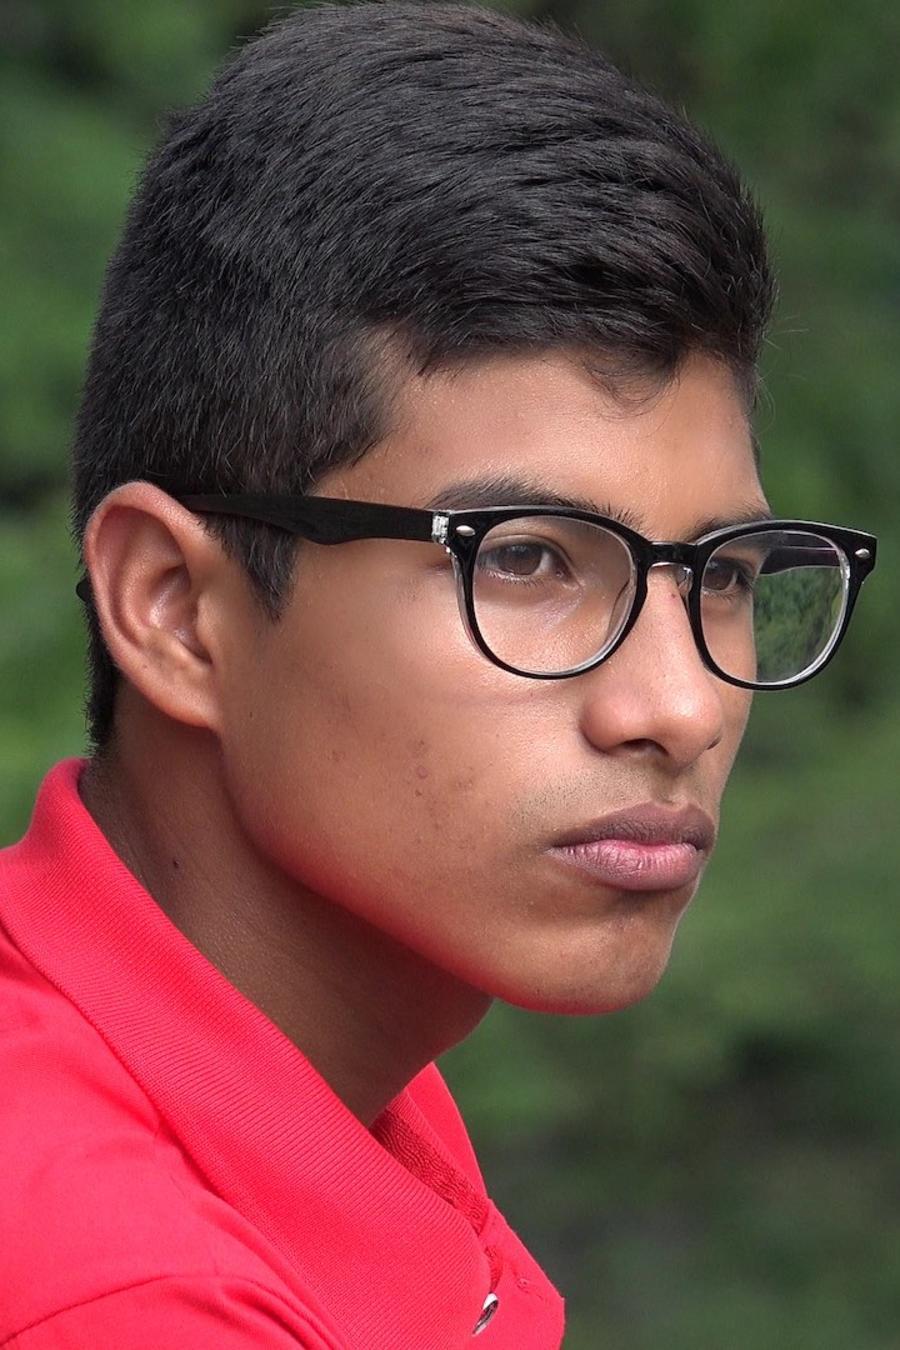 Joven latino con anteojos triste